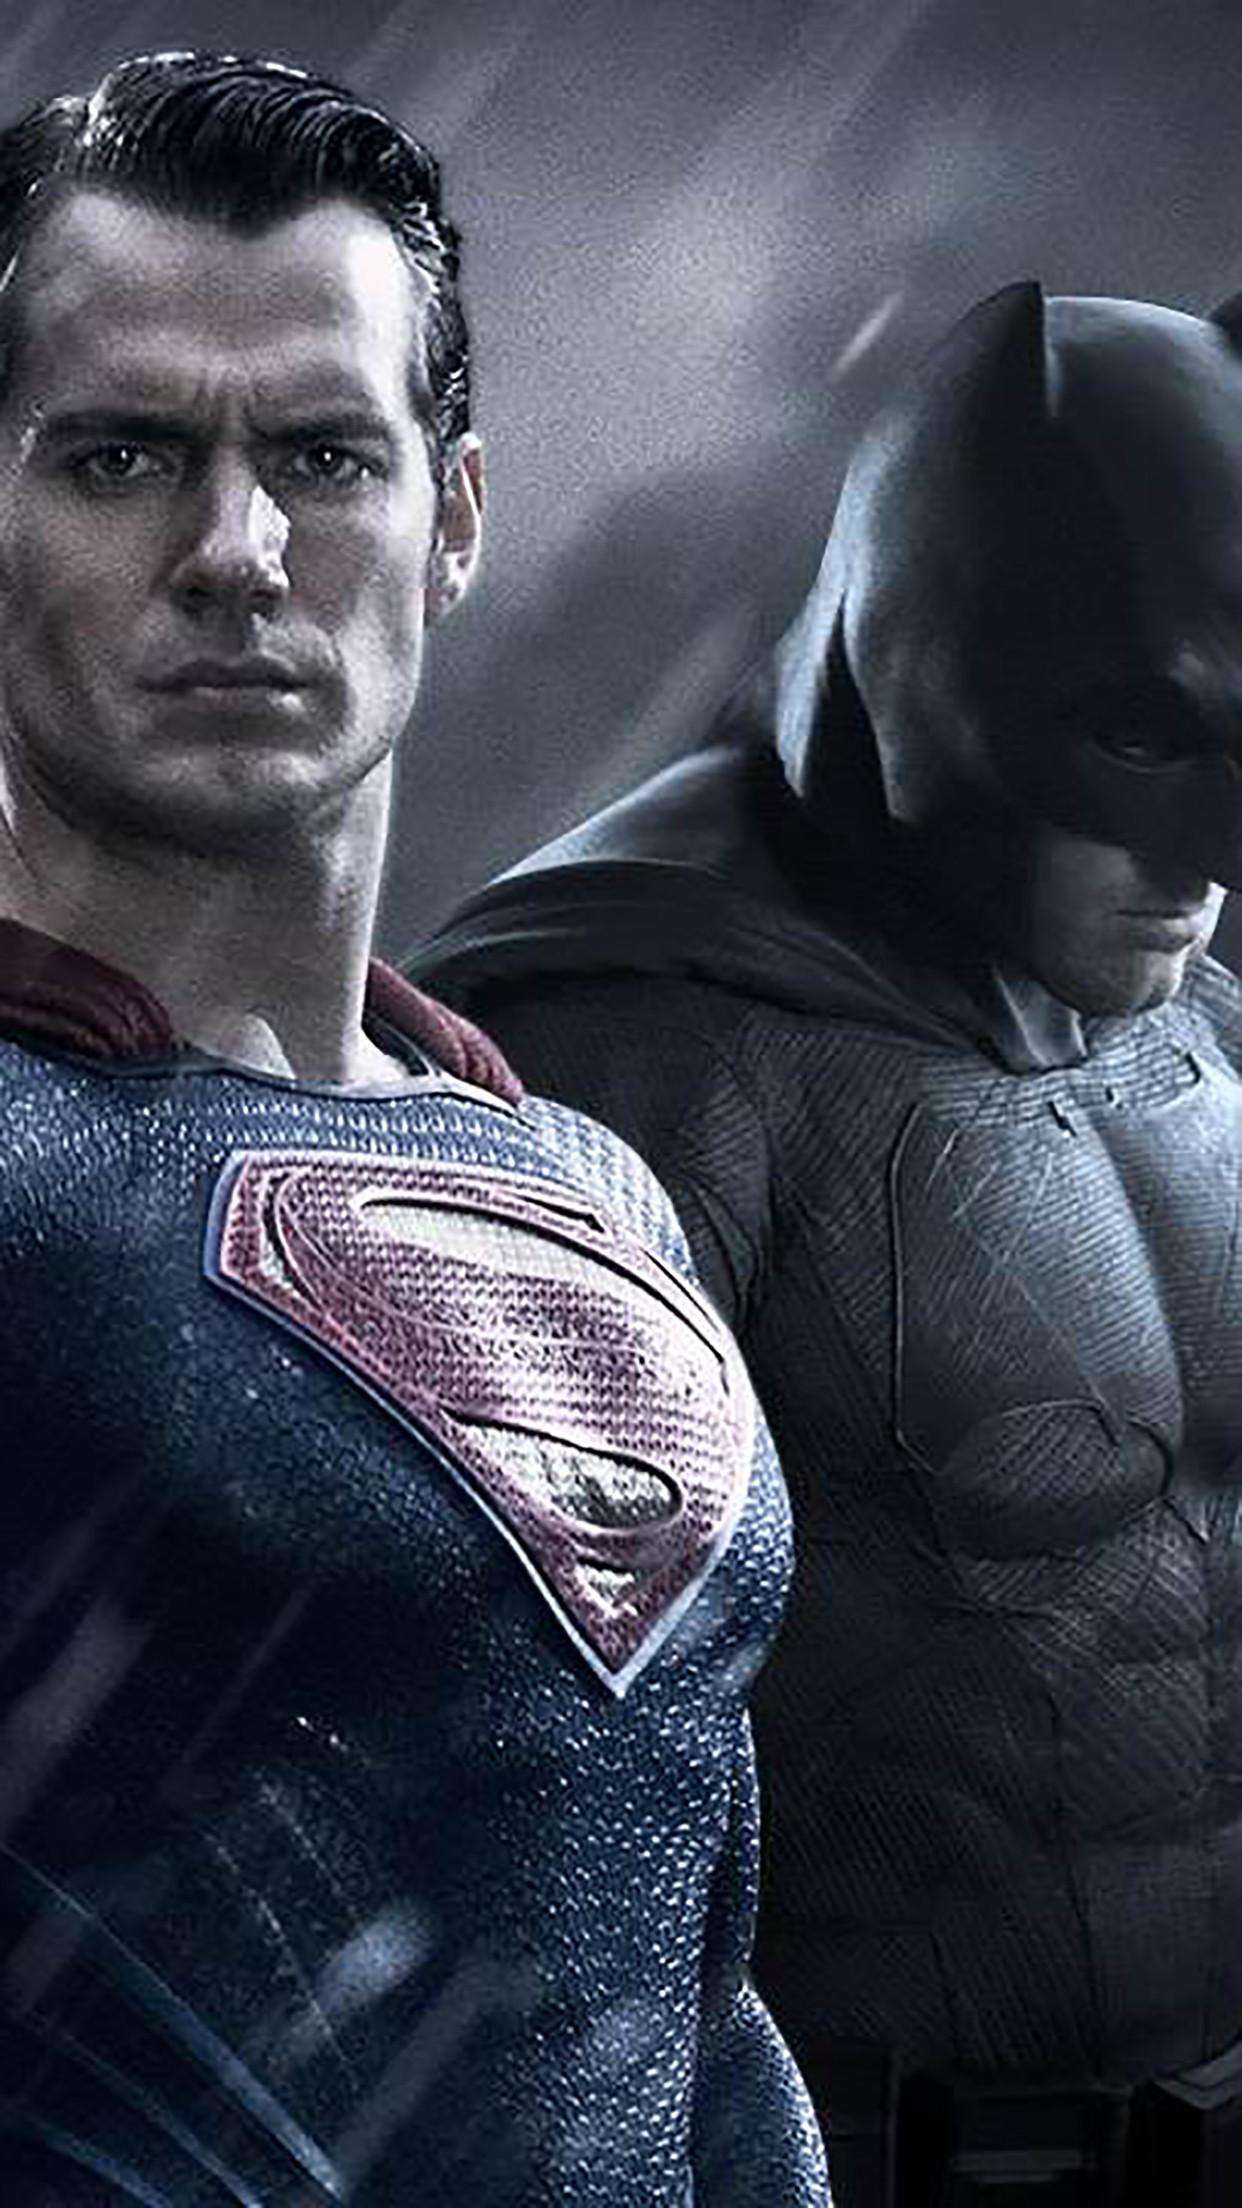 Wallpaper Hd Iphone Batman Vs Superman Free Download Superman Vs Batman 1242x2208 Wallpaper Teahub Io